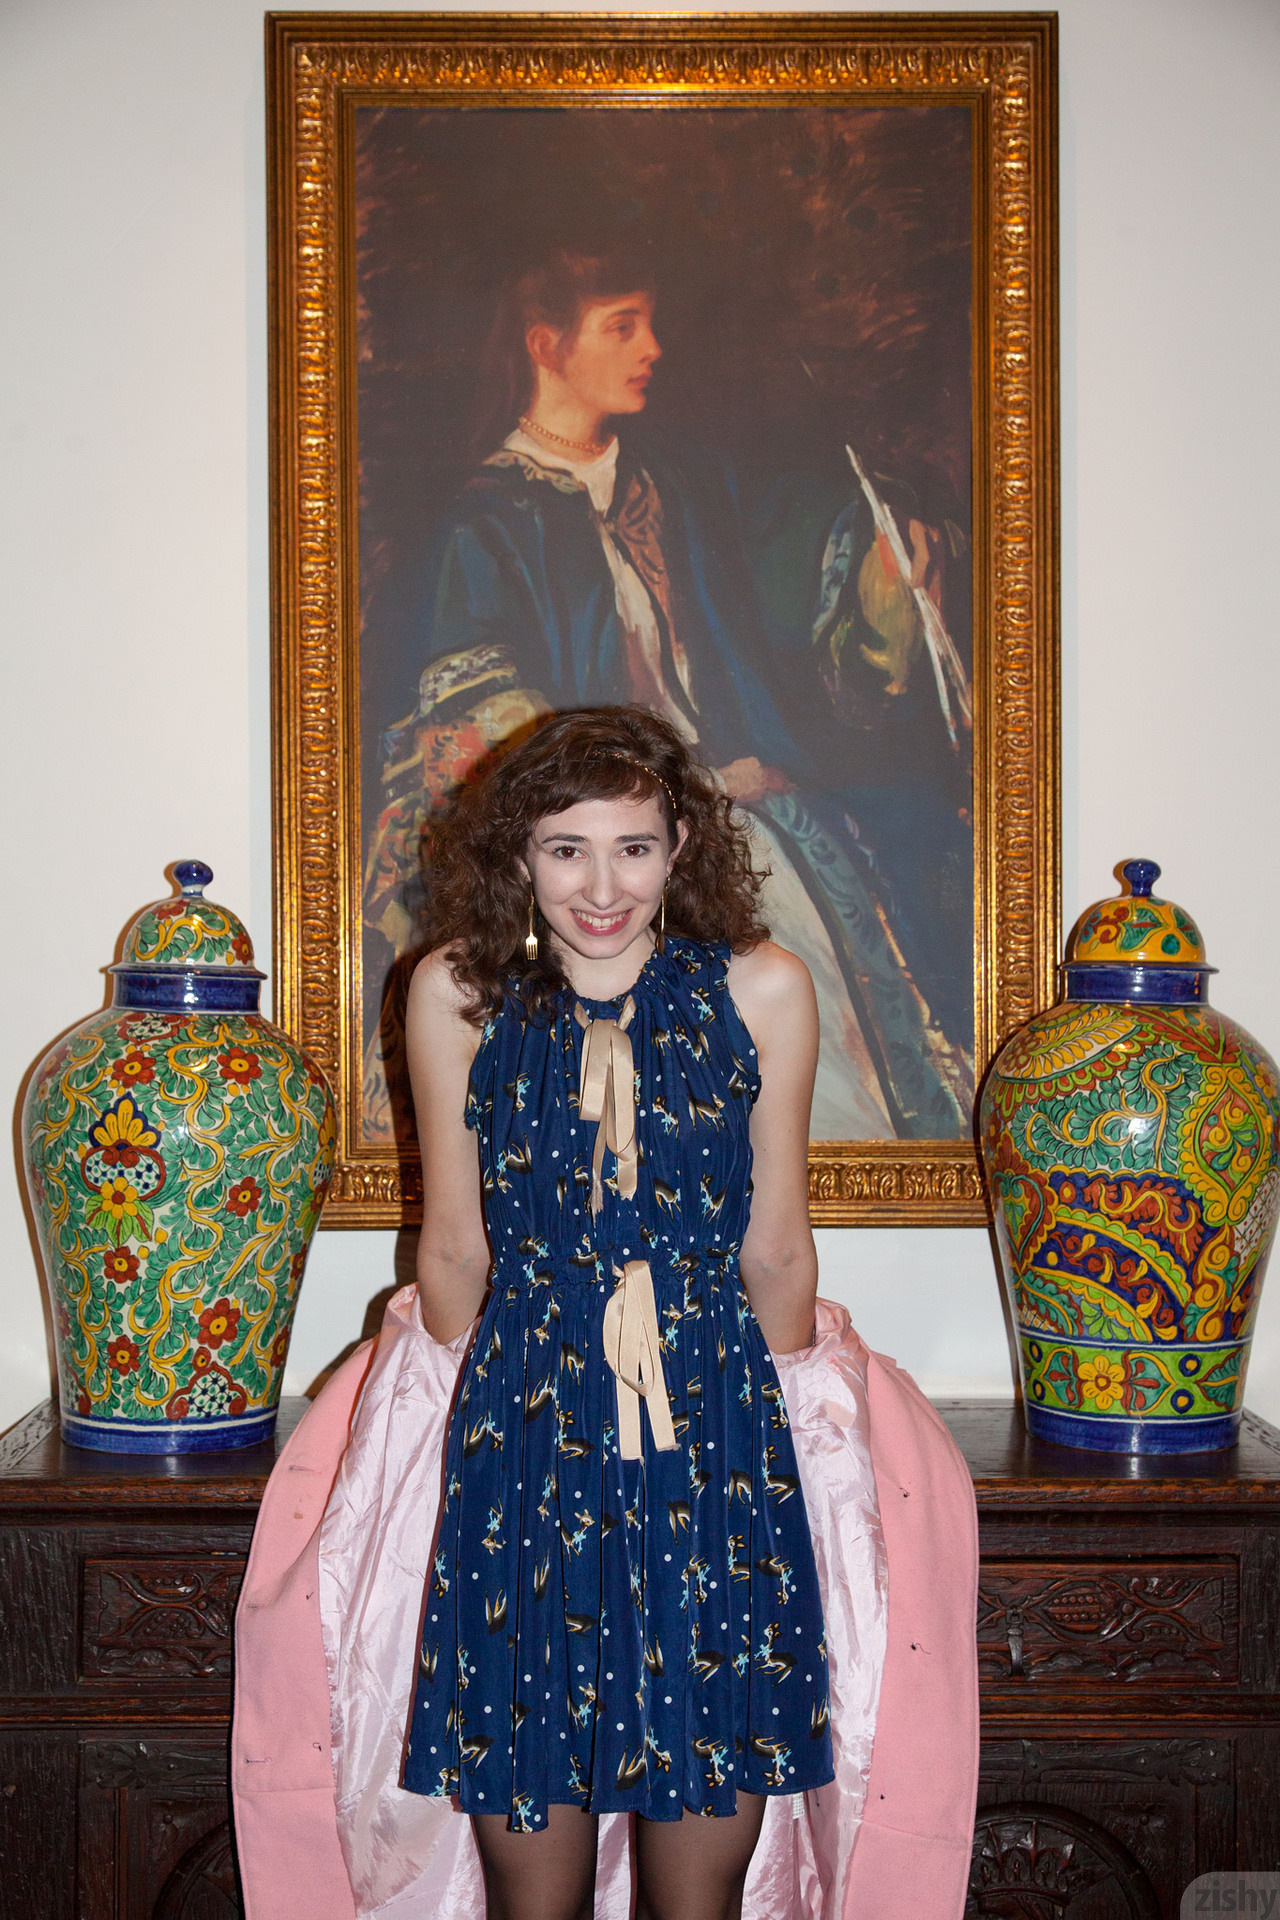 Yvette Nolot At Arizona Inn Zishy (17)